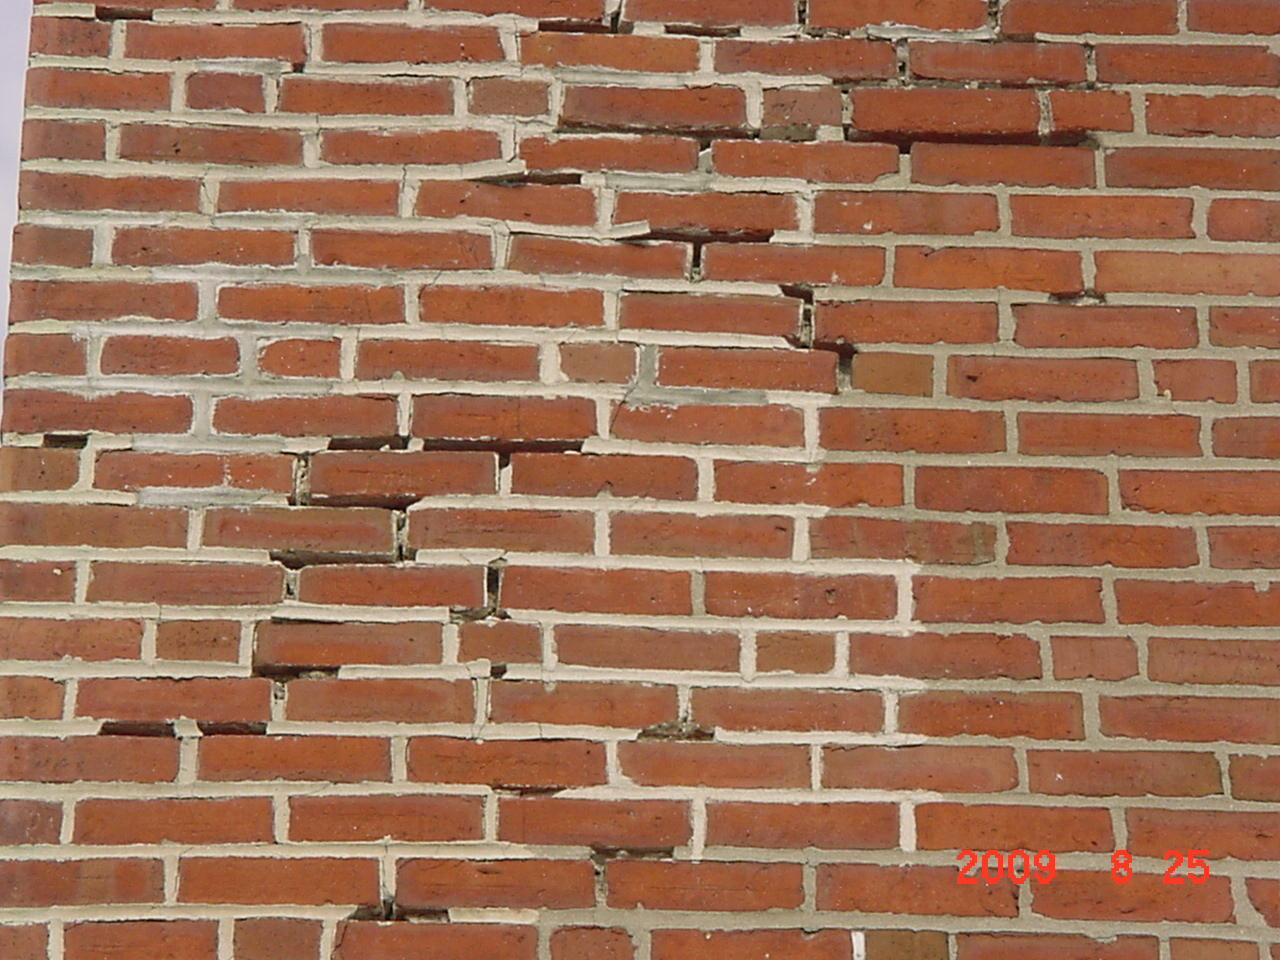 Exterior Masonary Wall Repair Pictures 004.jpg